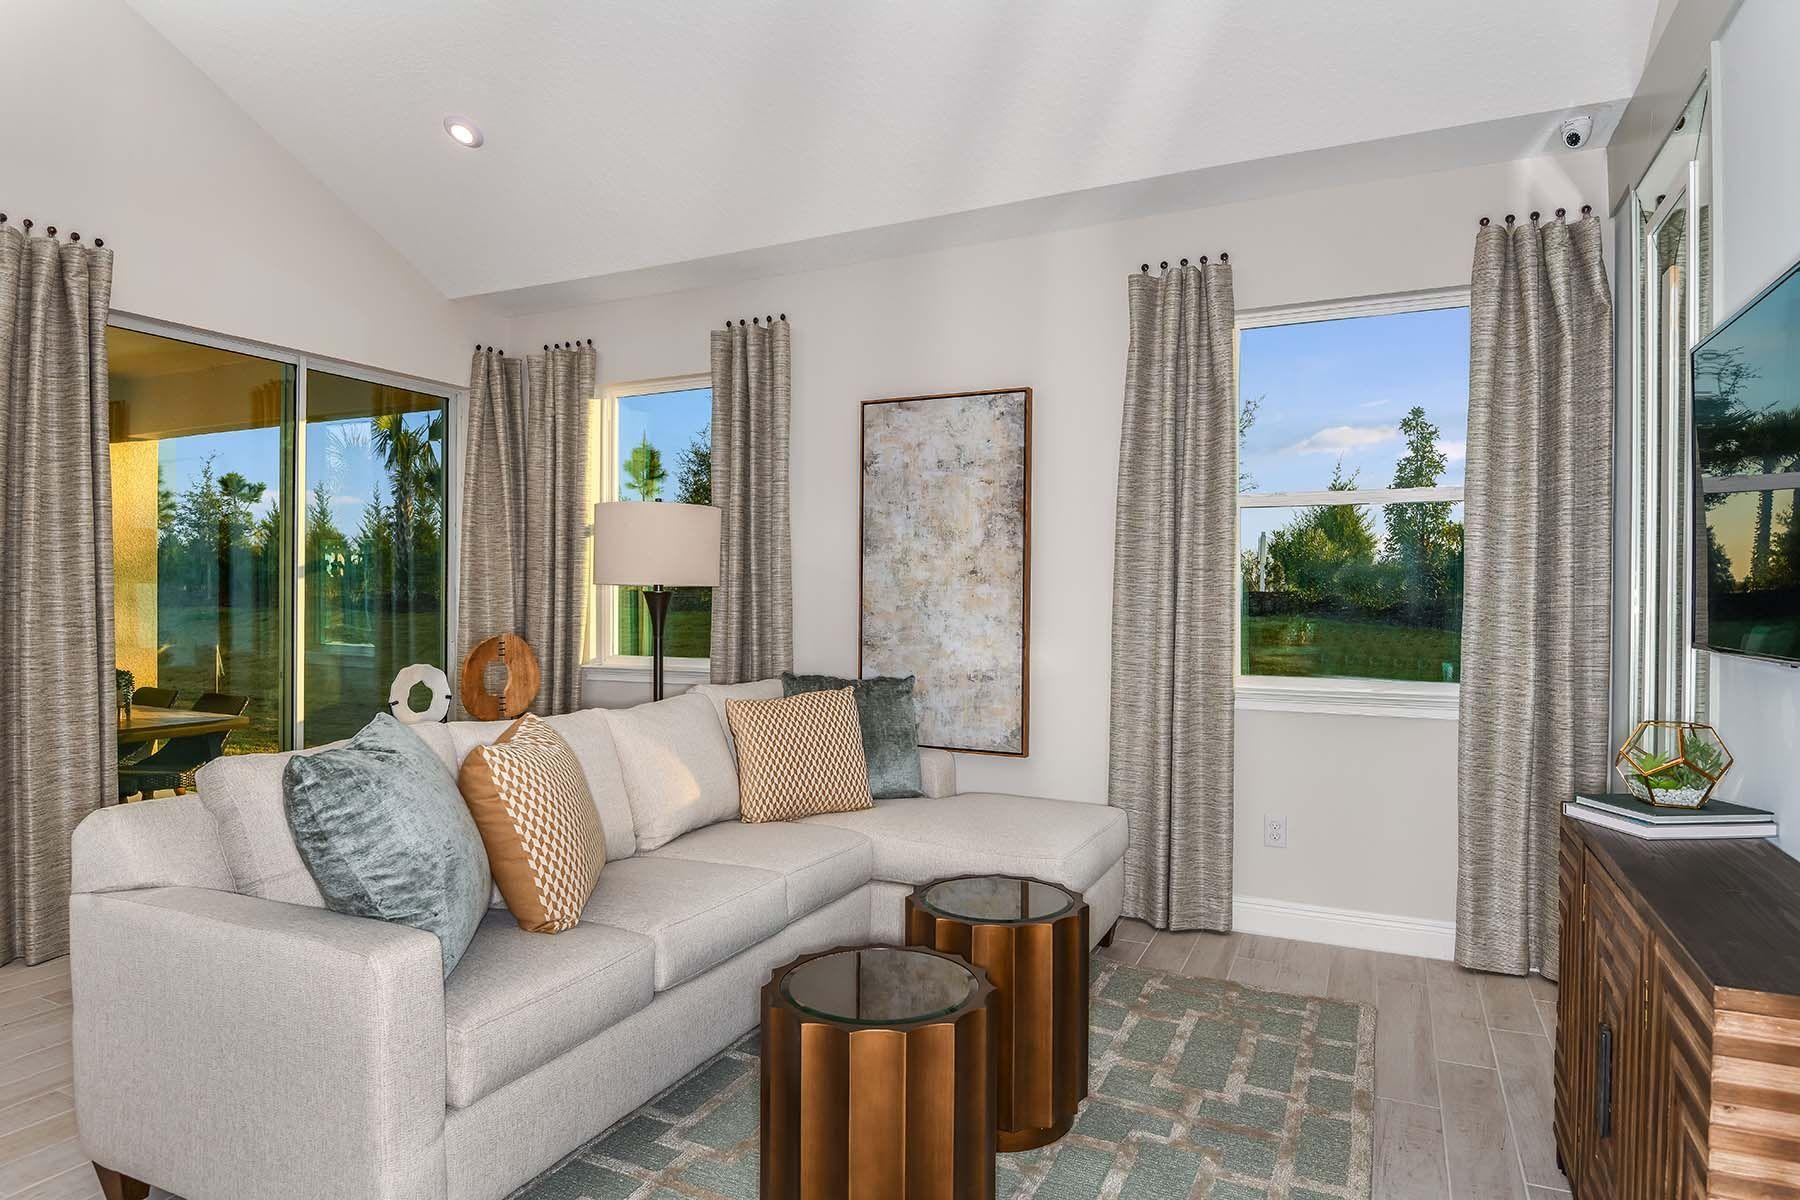 Living Area featured in the Sandbar By Mattamy Homes in Sarasota-Bradenton, FL